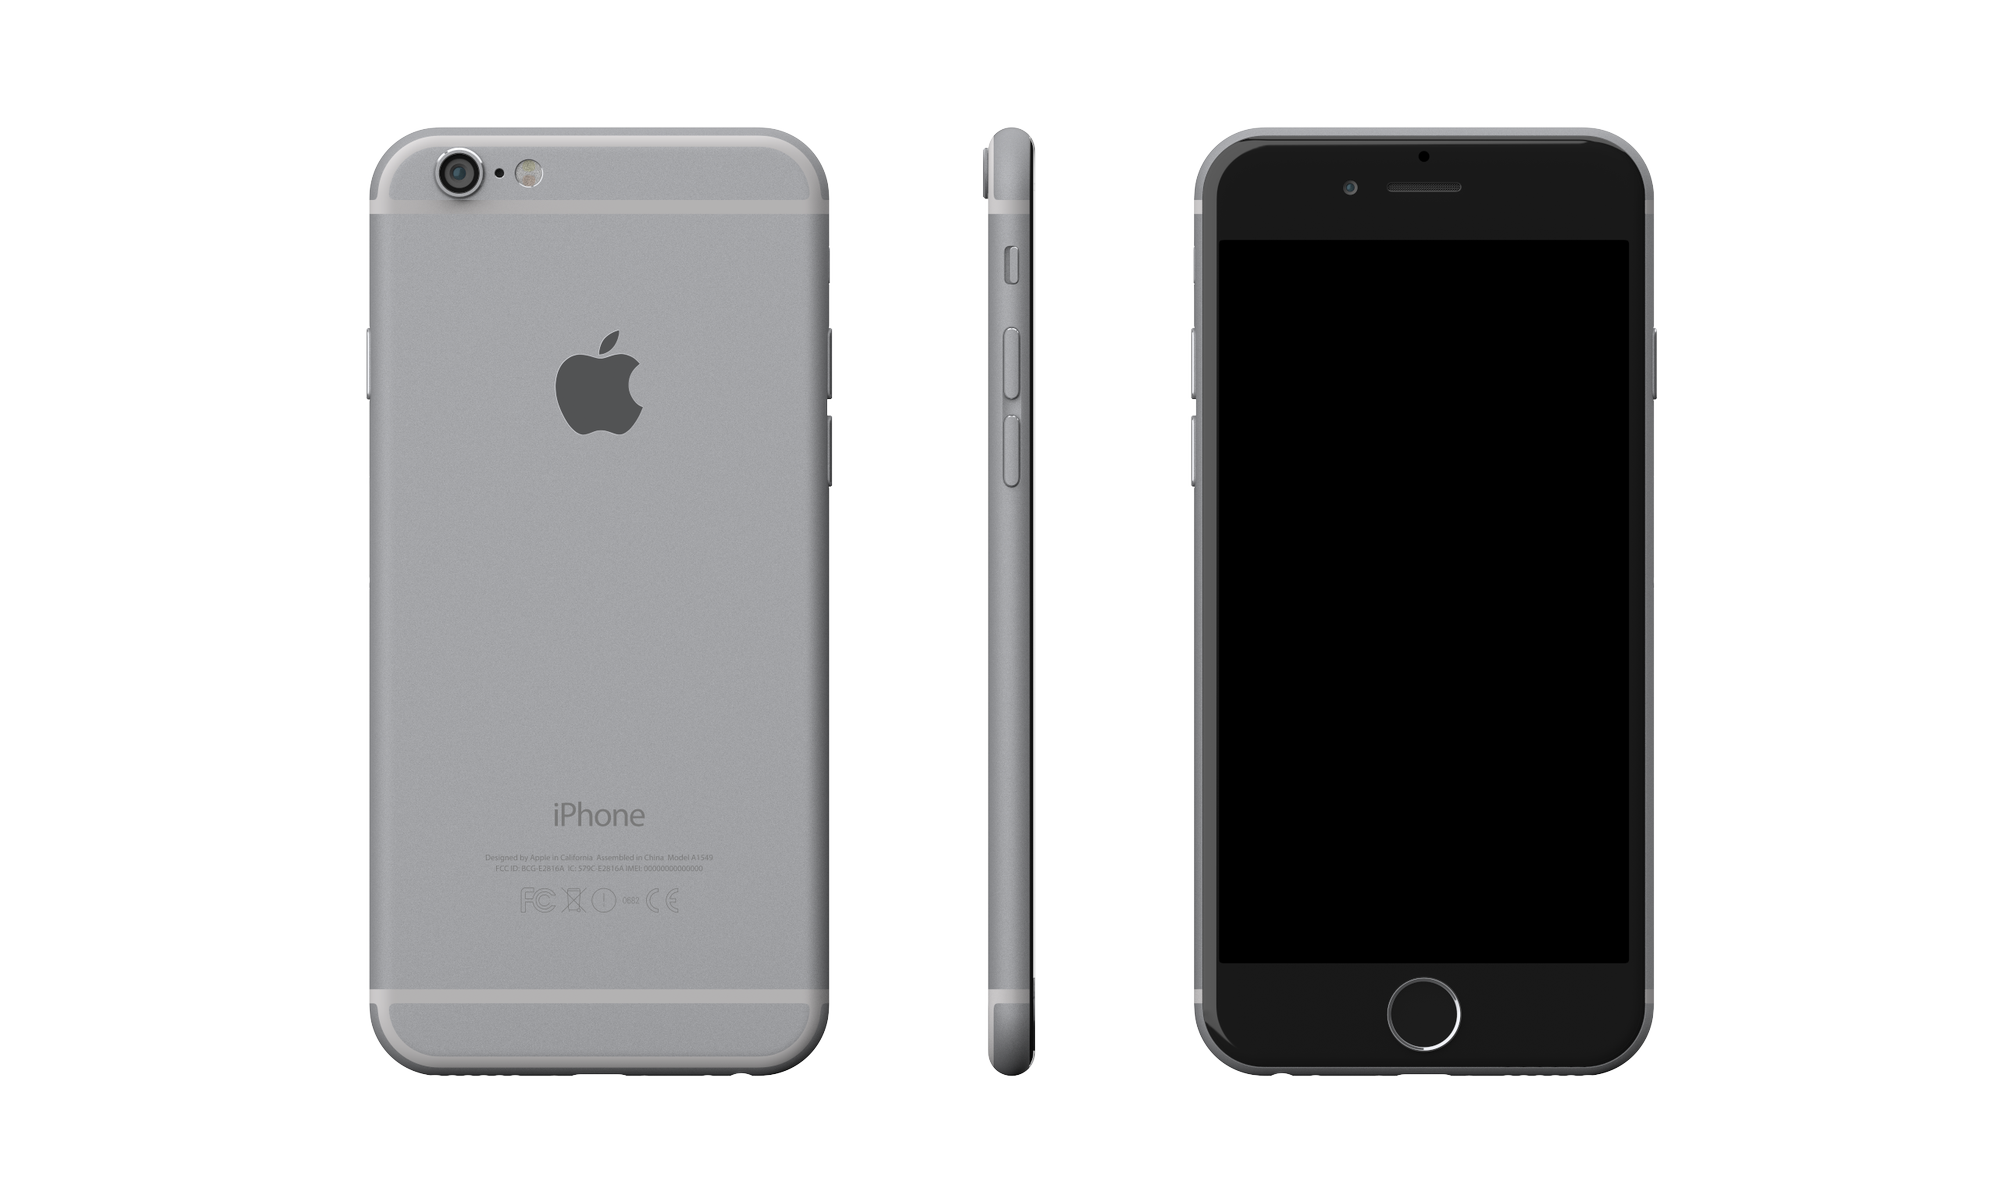 iphone 6 skiniphone 6 skin space gray